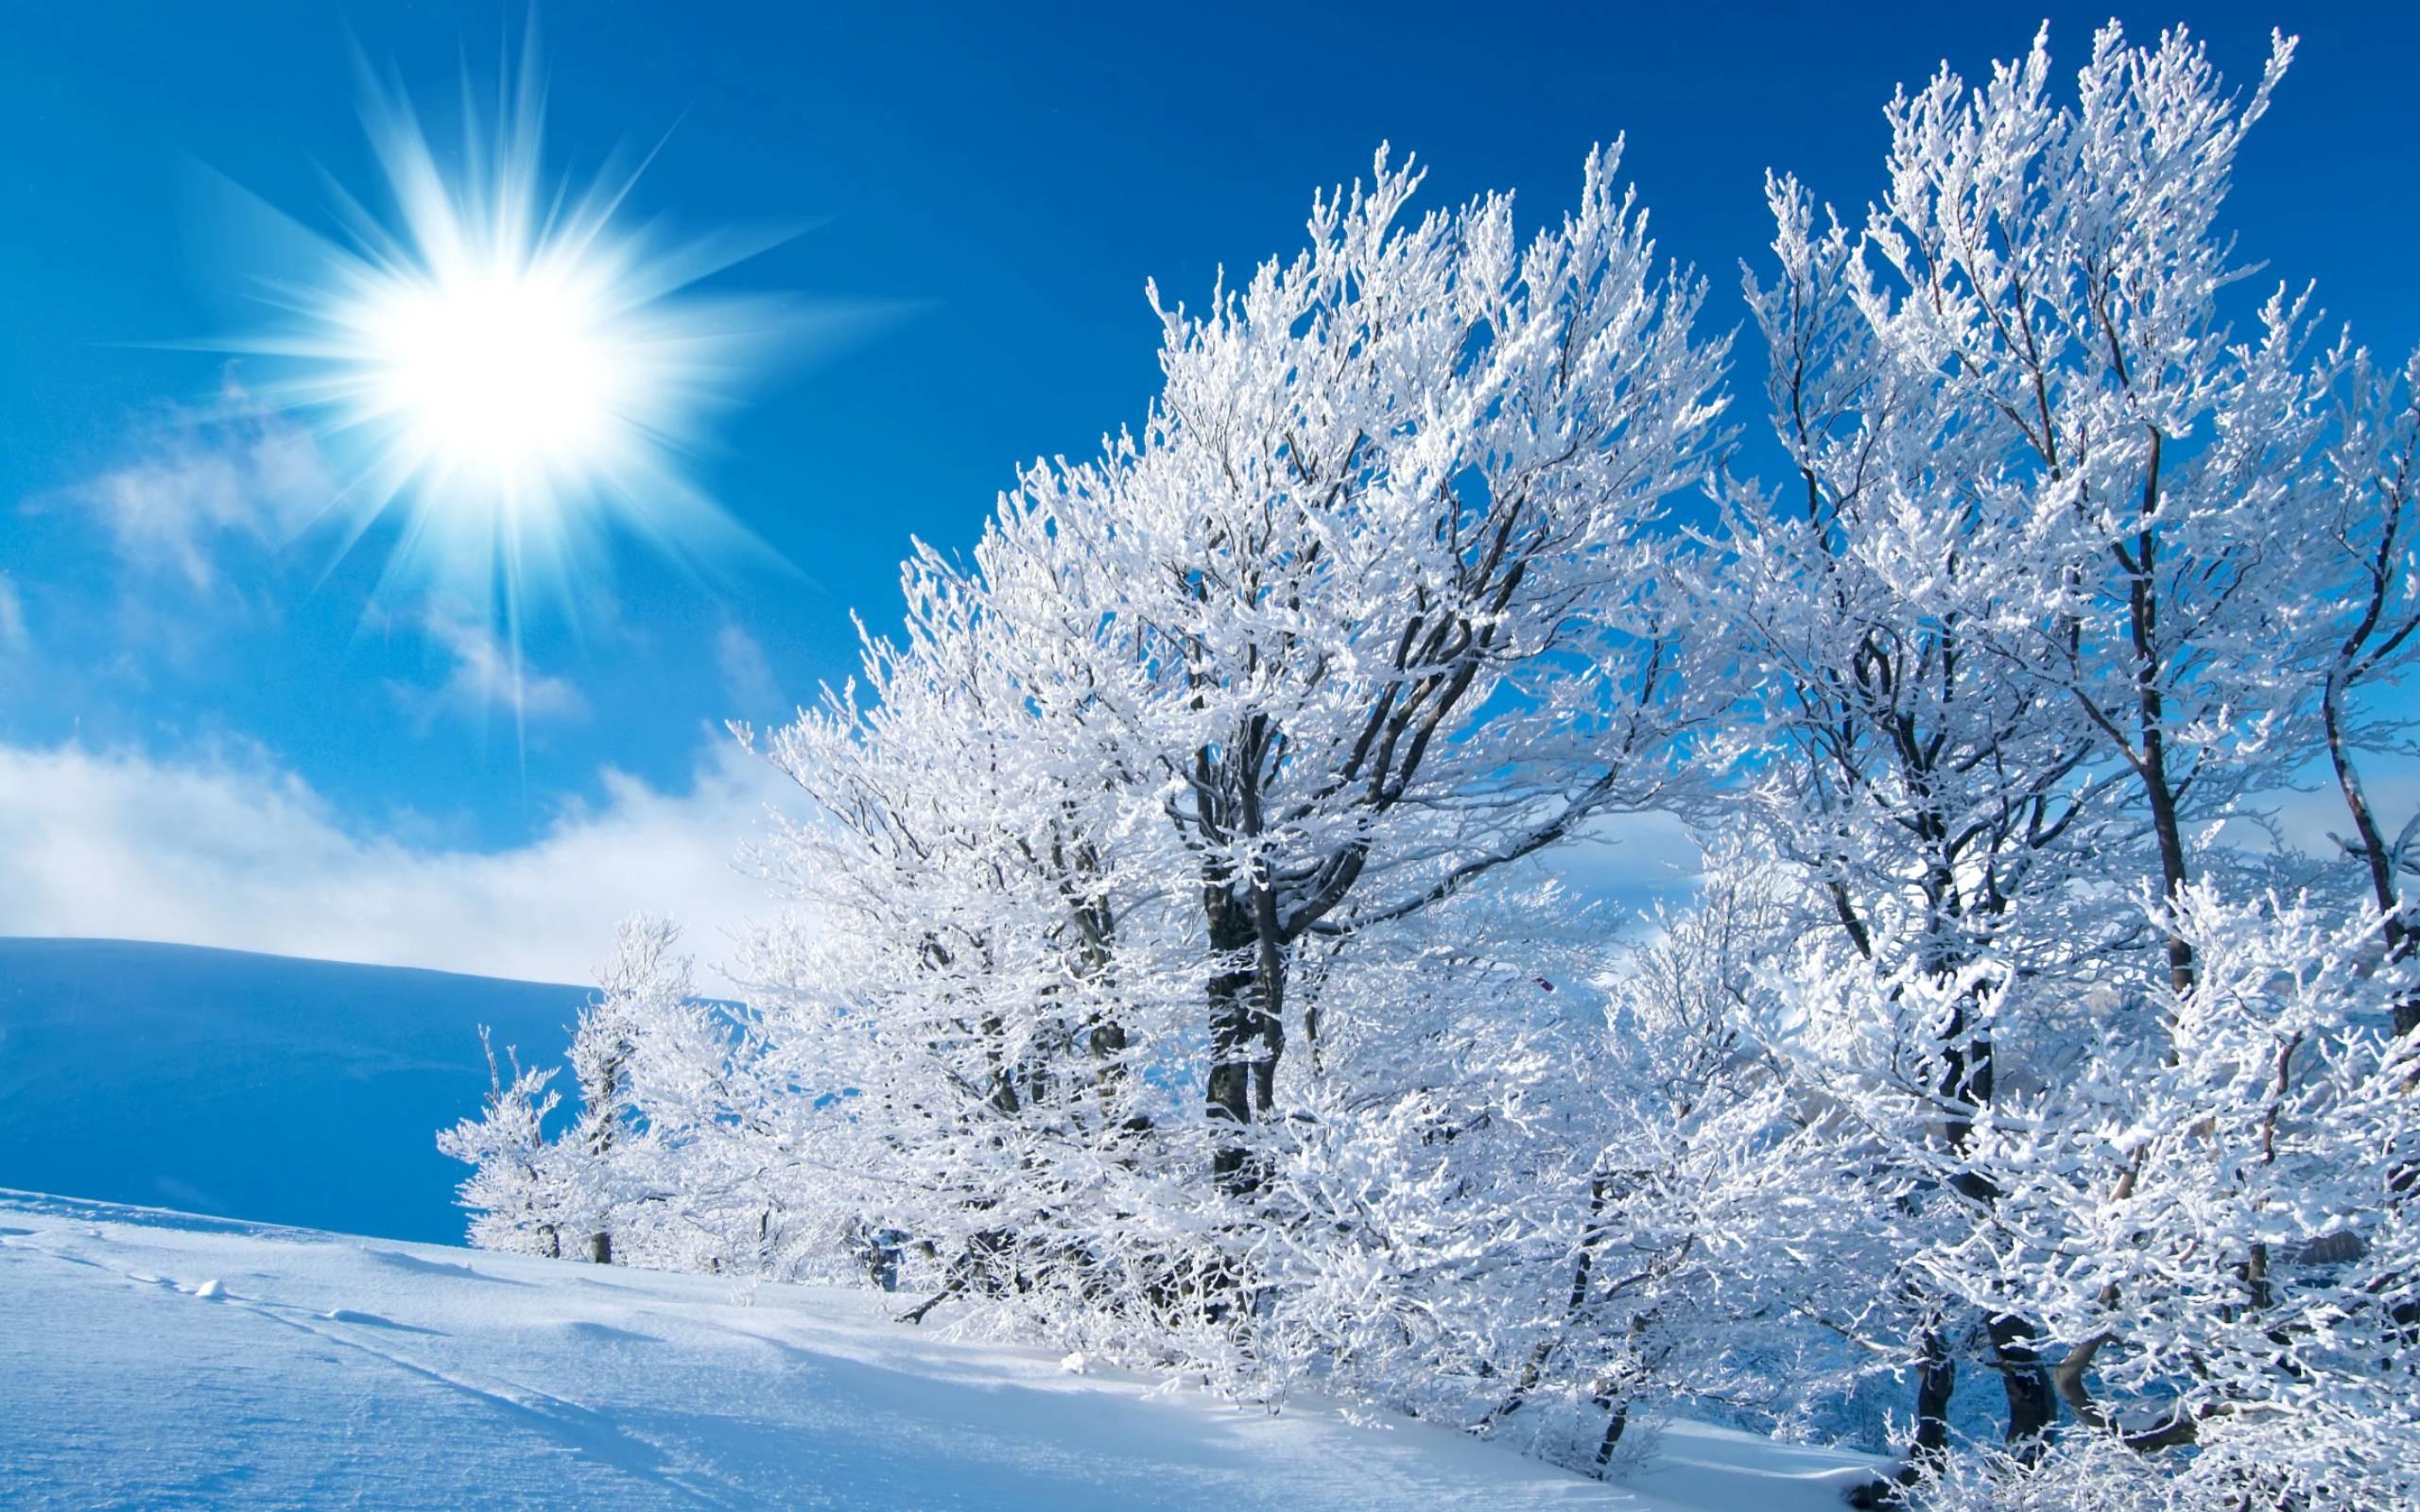 Winter HD Wallpapers